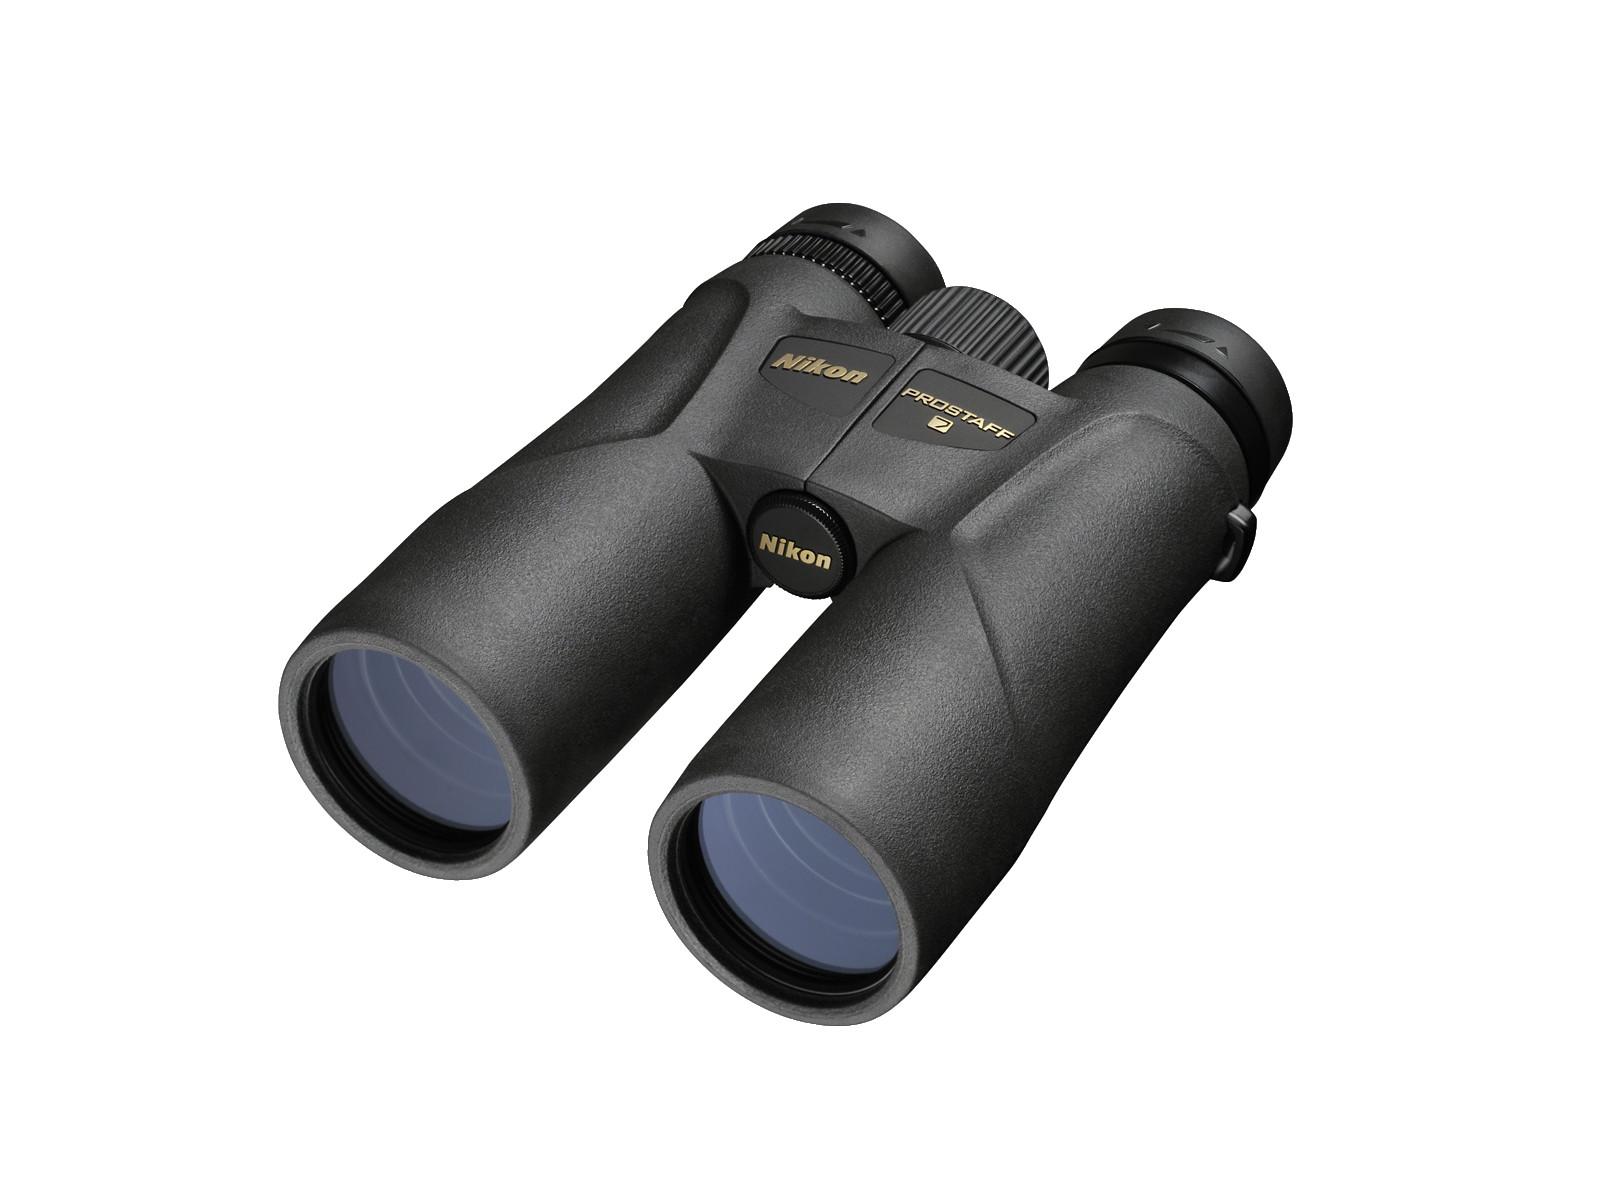 Prostaff 7s 10X42 雙筒望遠鏡